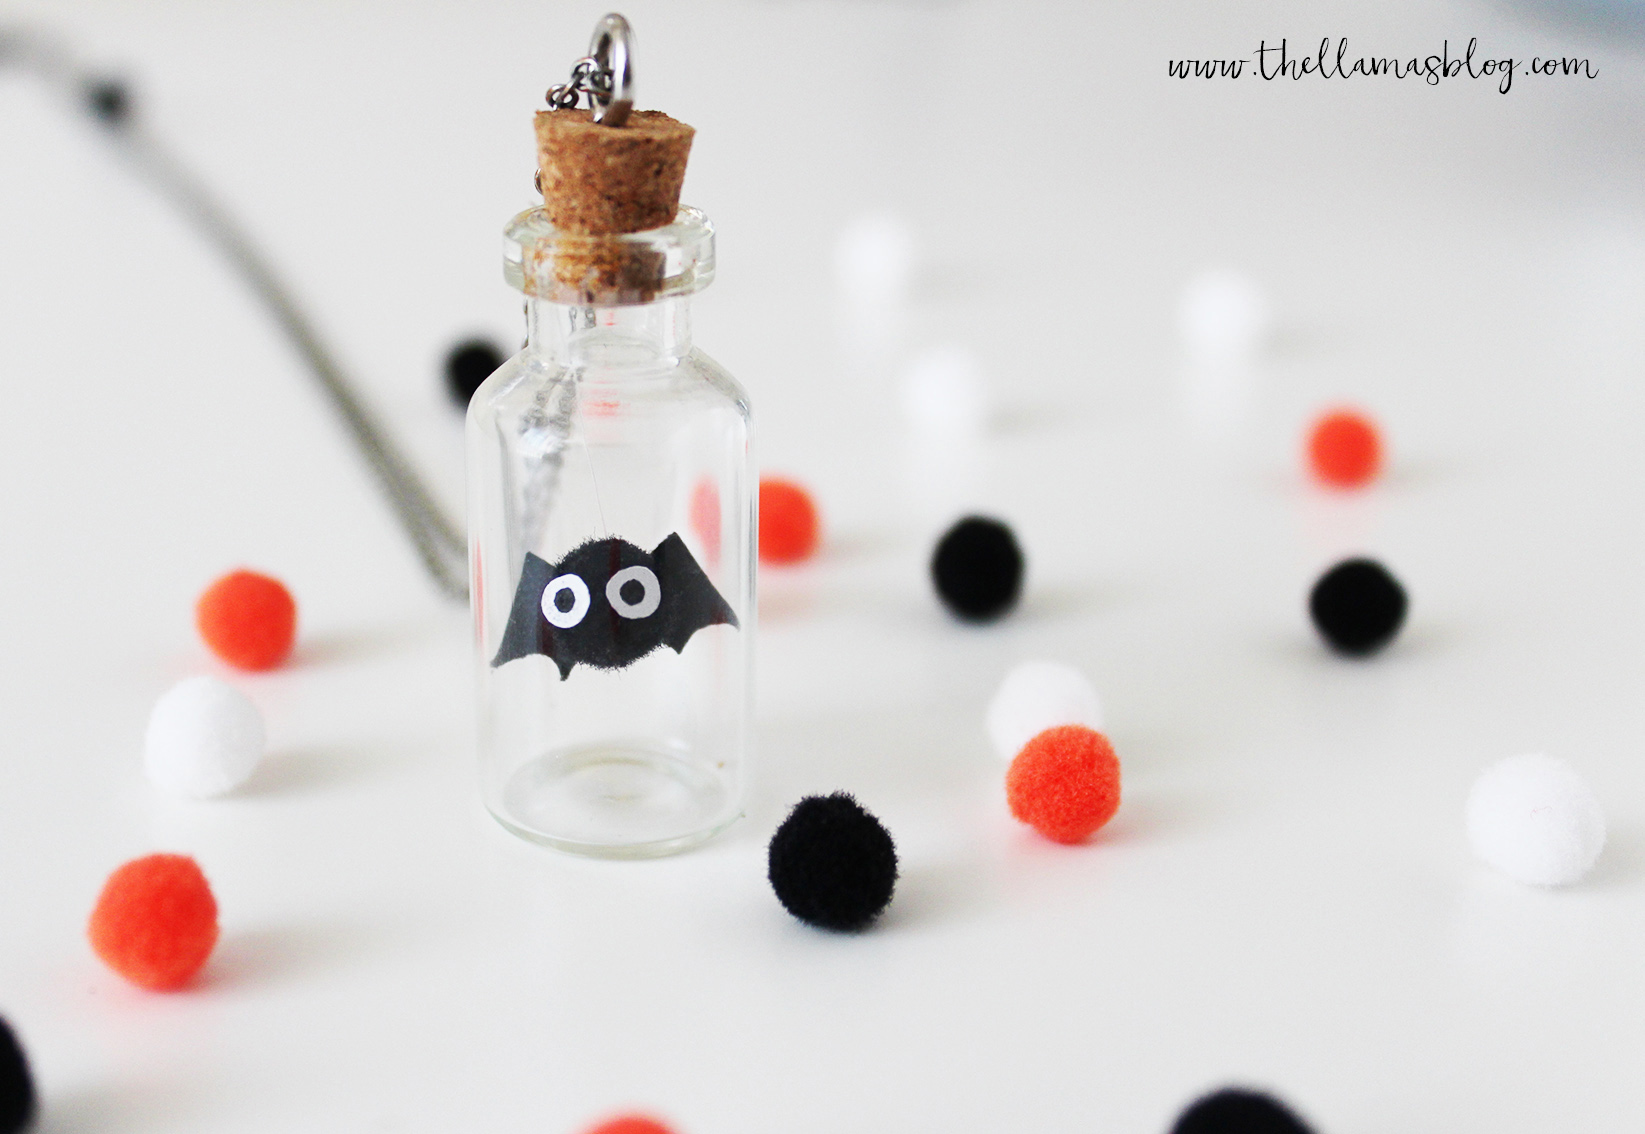 the llamas_DIY_Halloween_Buddy_Necklace_2_Thellamasblog